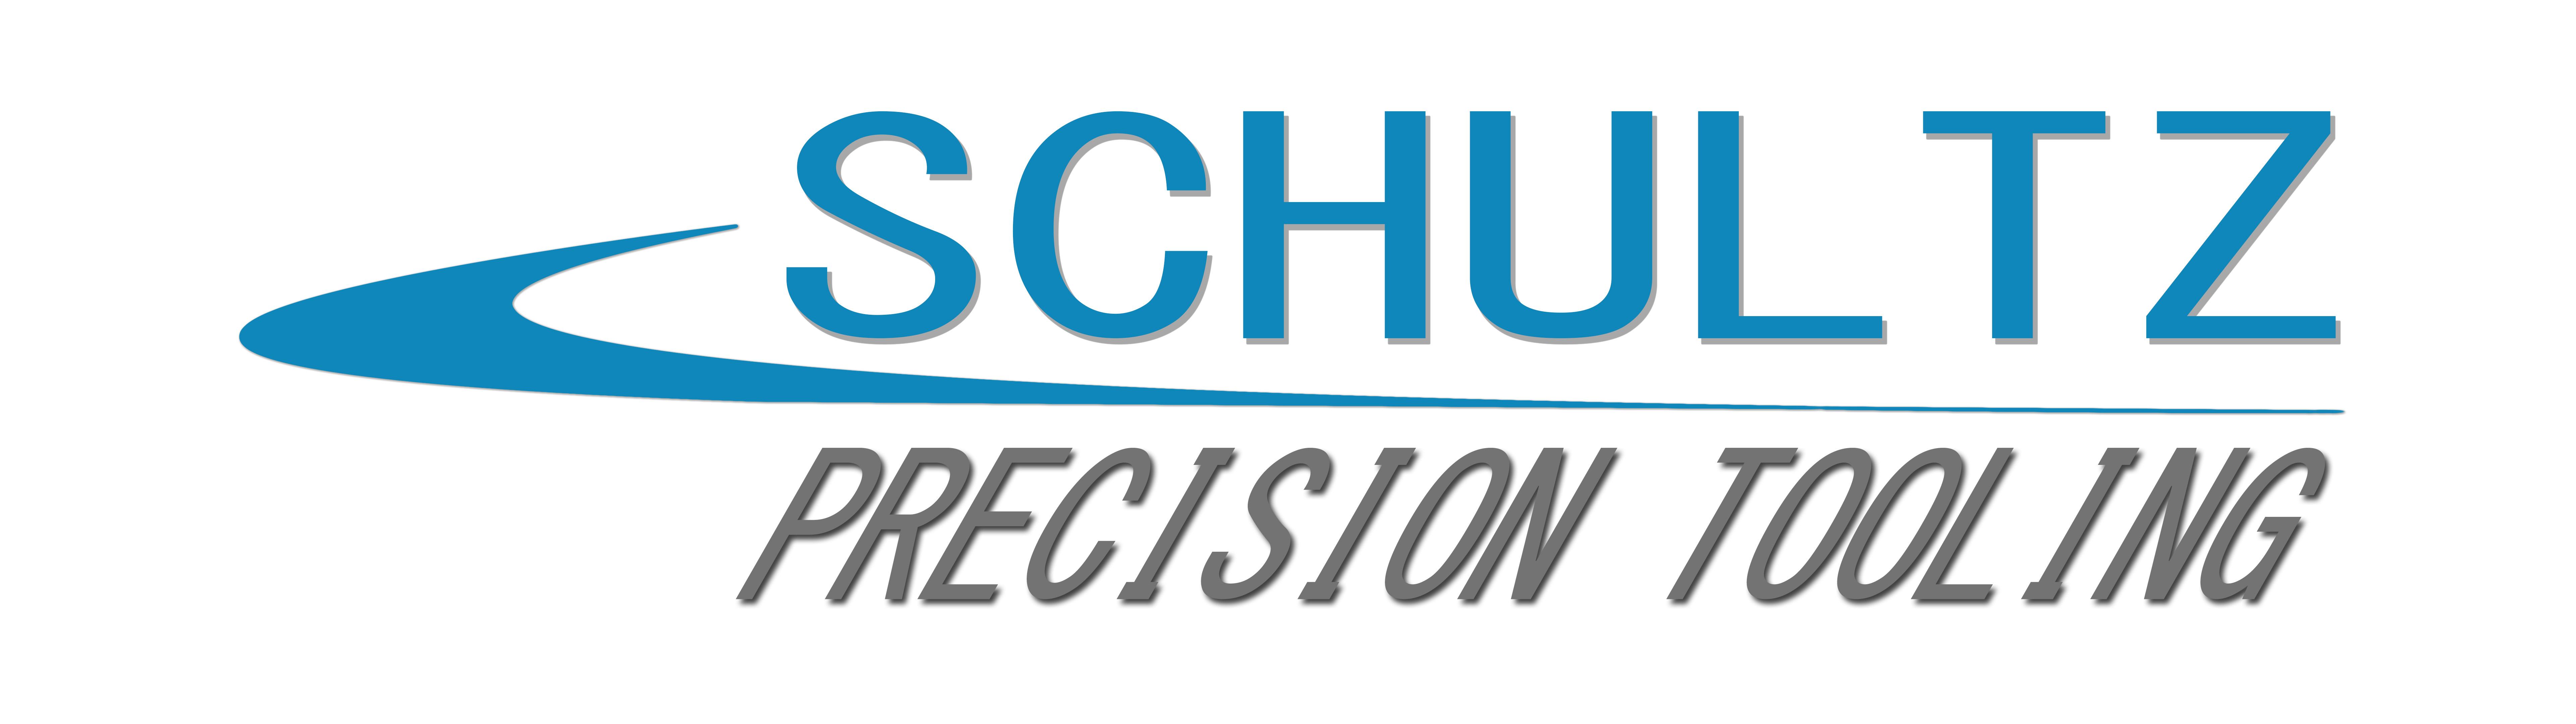 Schultz Precision Tooling